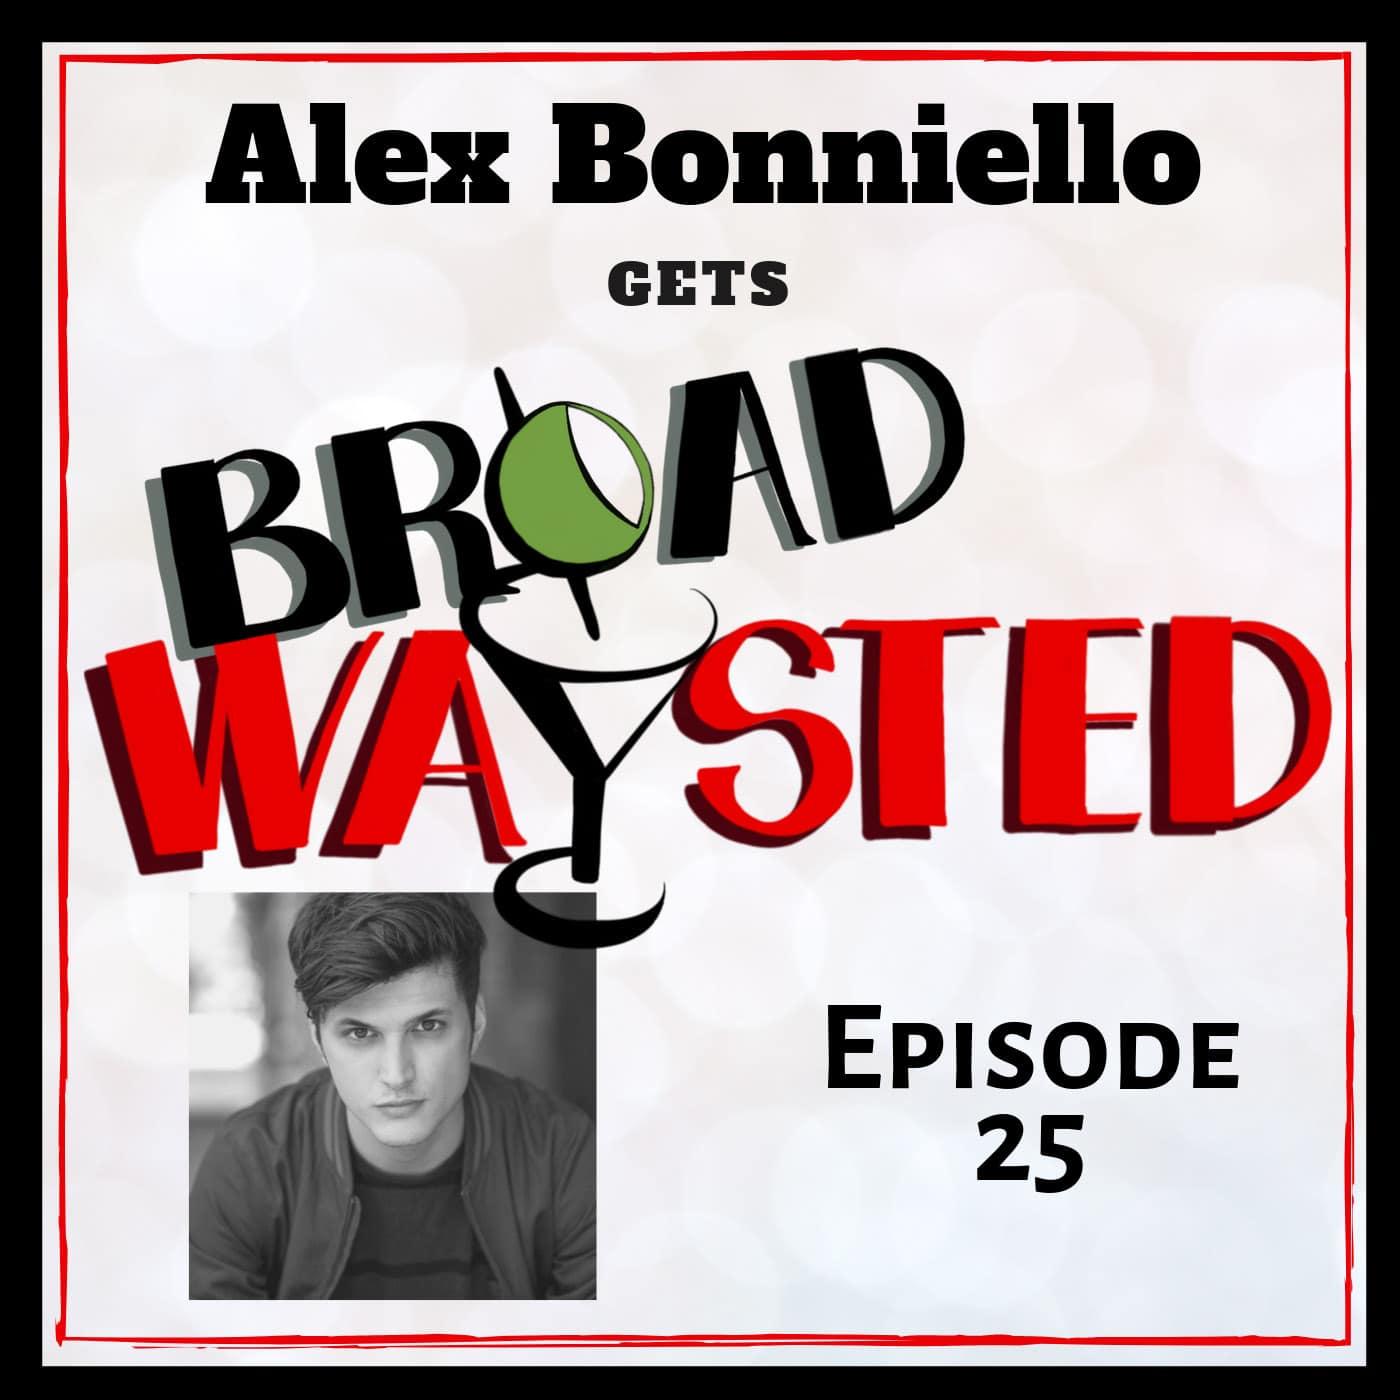 Broadwaysted Ep 25 Alex Boniello